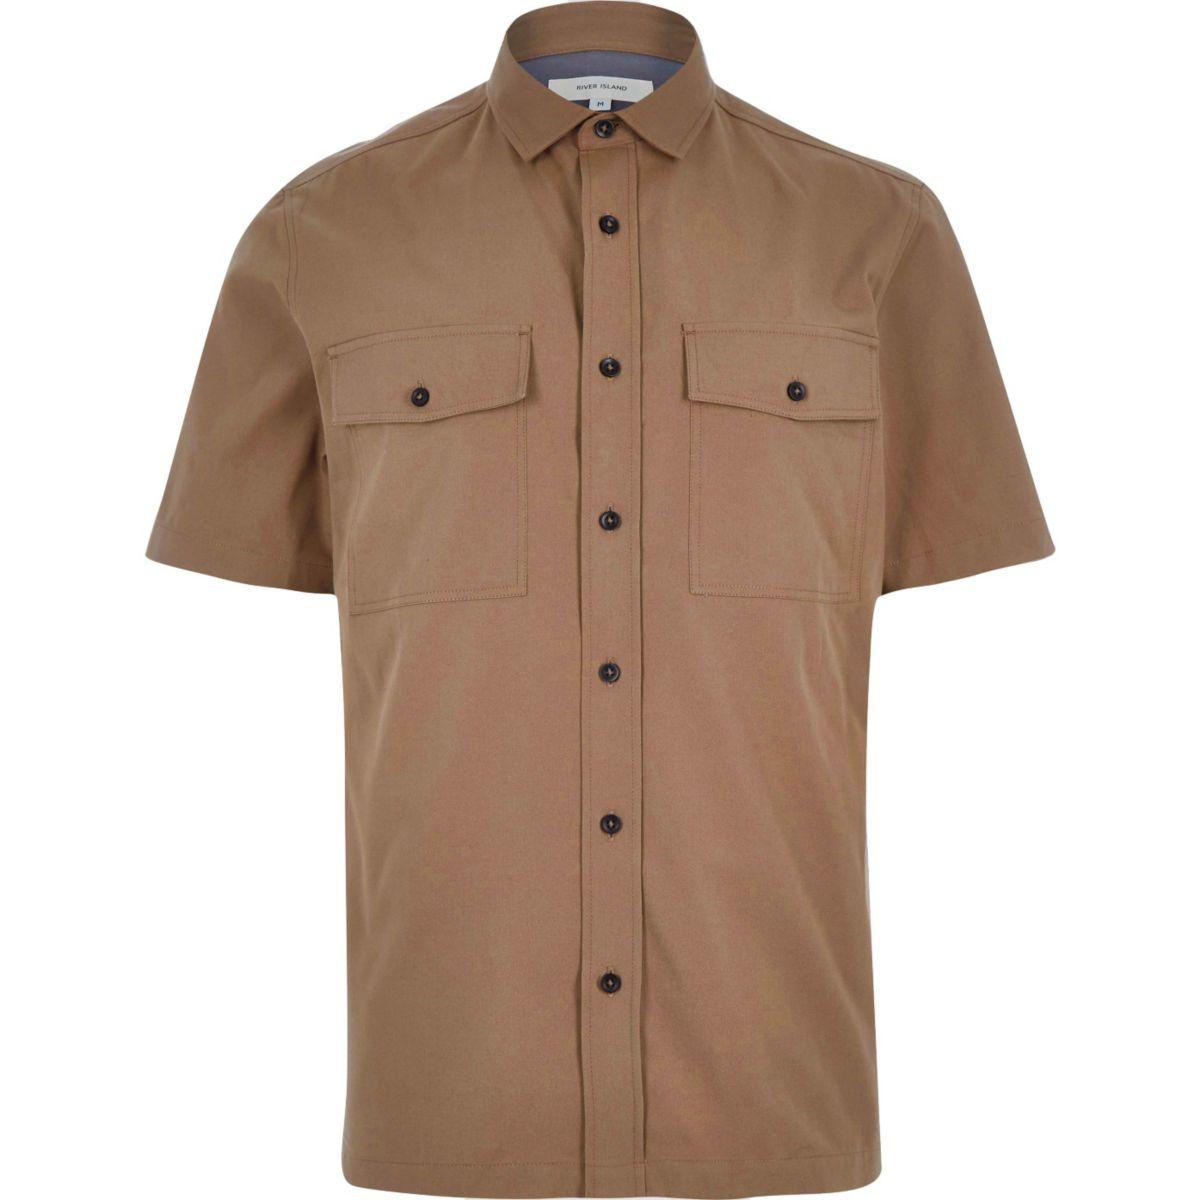 Braunes kurzärmeliges Utility-Hemd